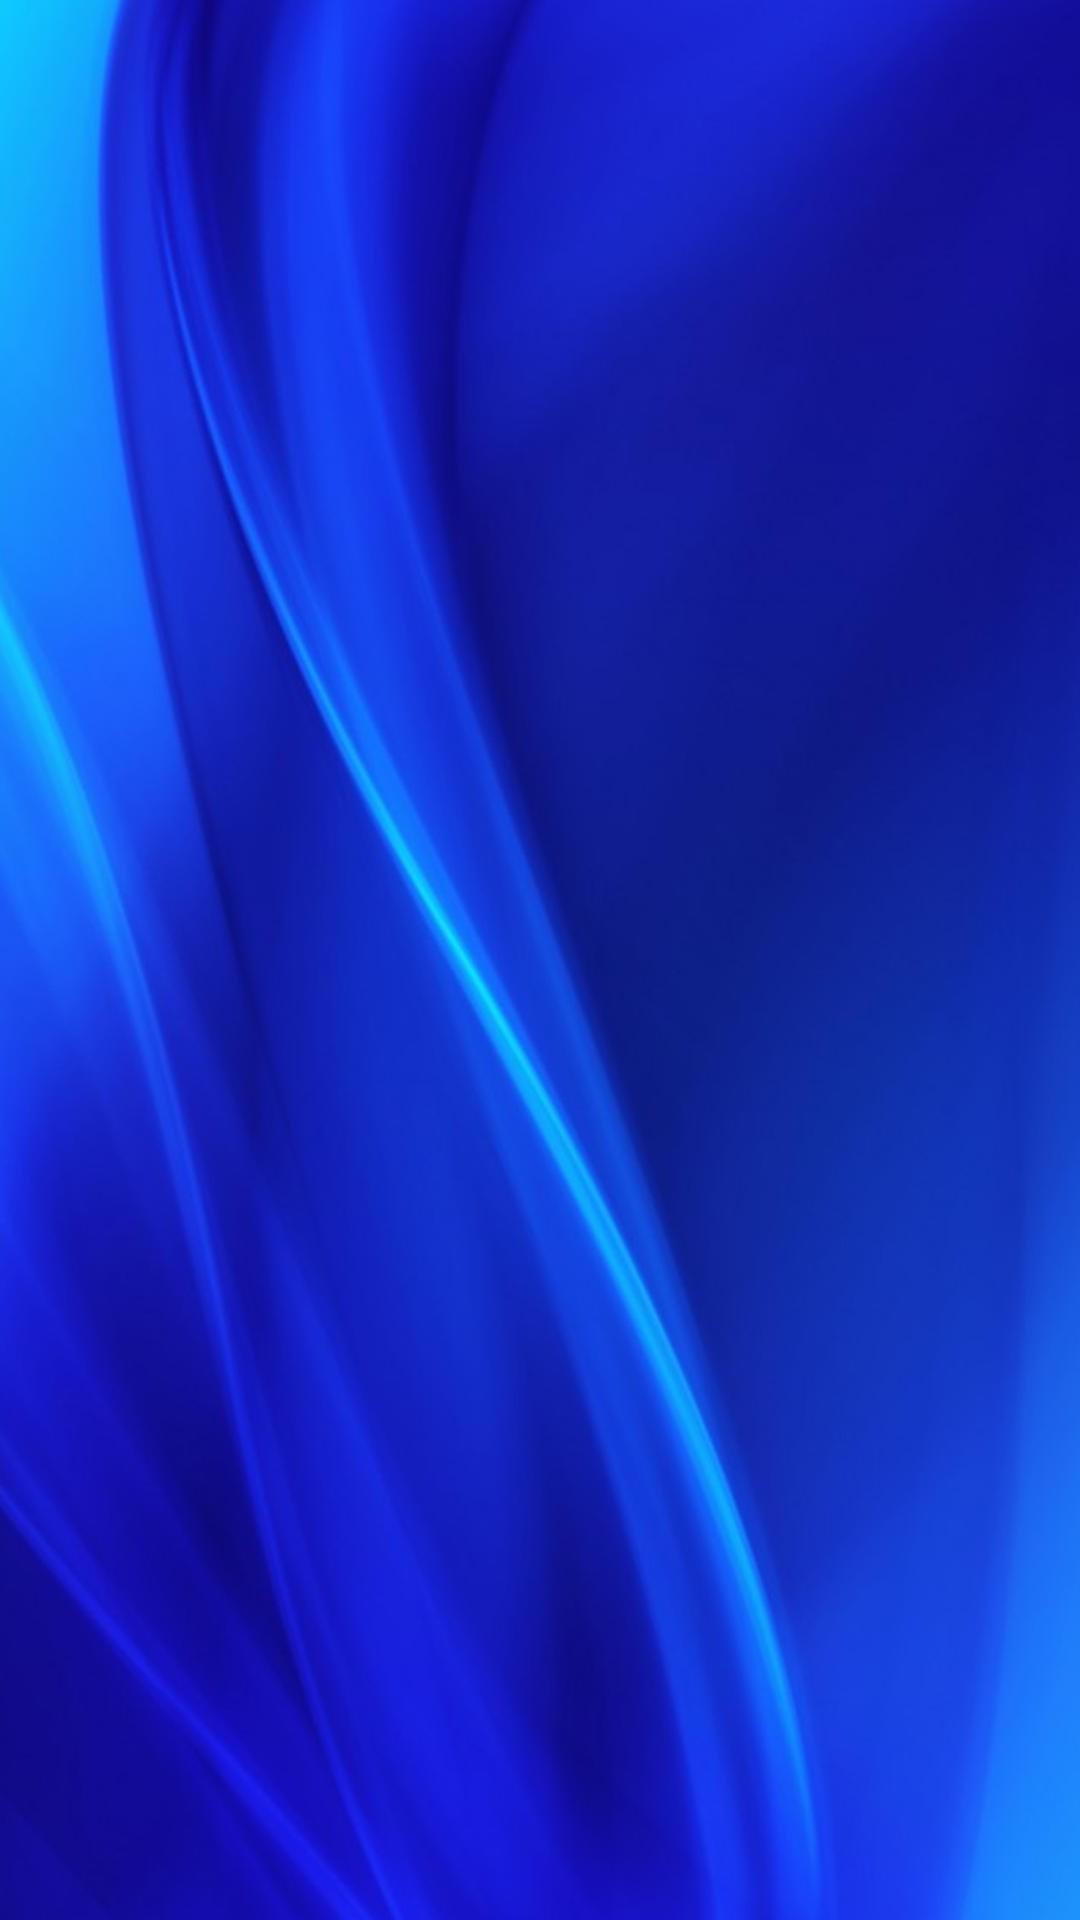 Samsung Wallpaper Hd 1080p Samsung Wallpaper Hd 4k 740x1316 Download Hd Wallpaper Wallpapertip